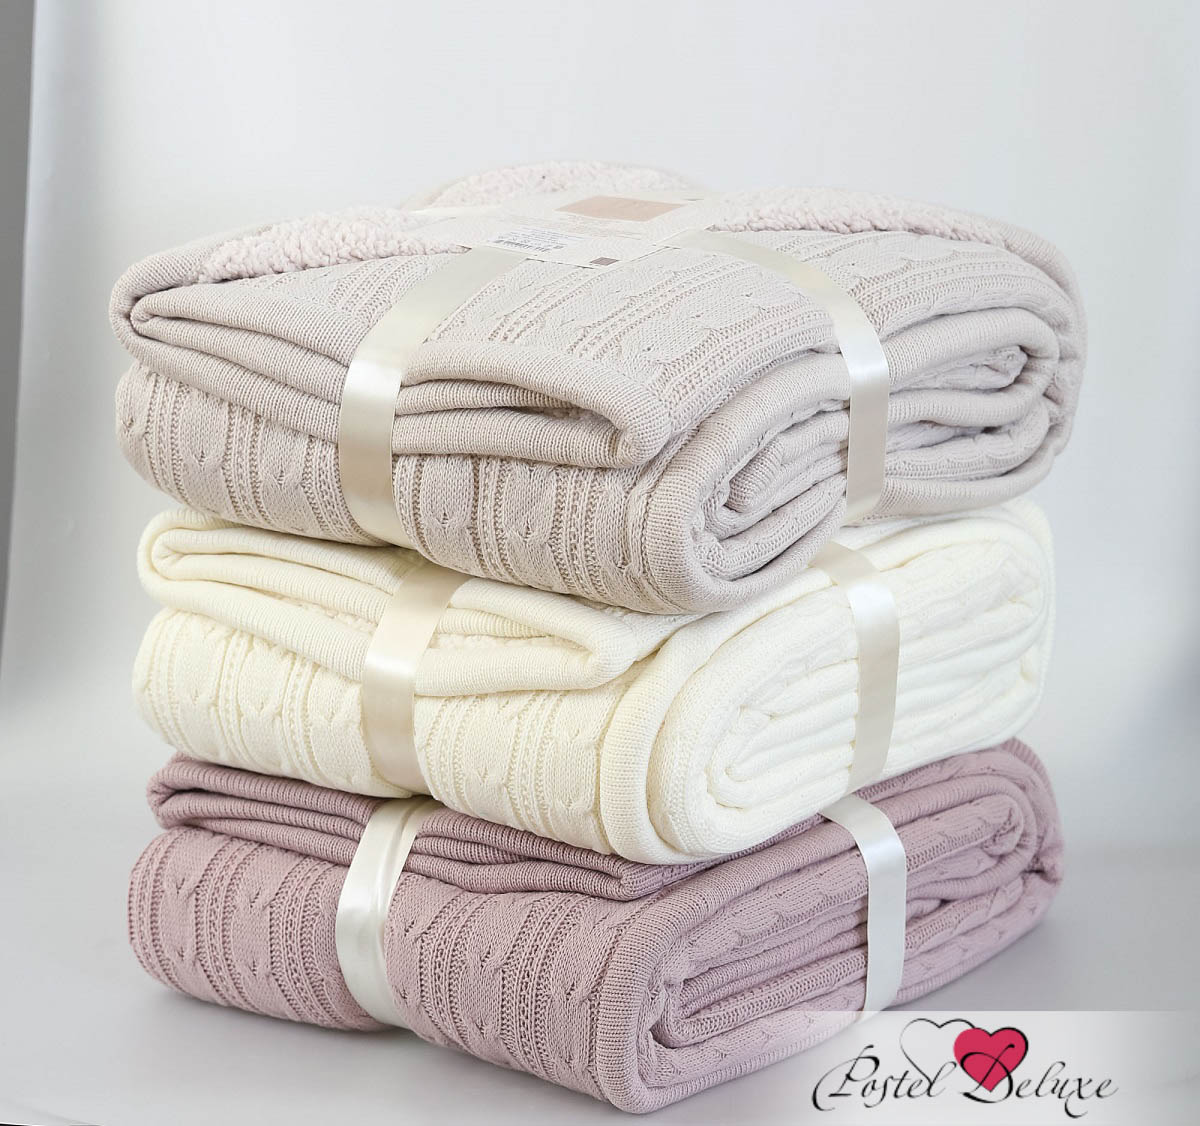 Плед Modalin Плед Leslie Цвет: Пудра (160х220 см) modalin modalin полотенце petek цвет розовый 70х140 см